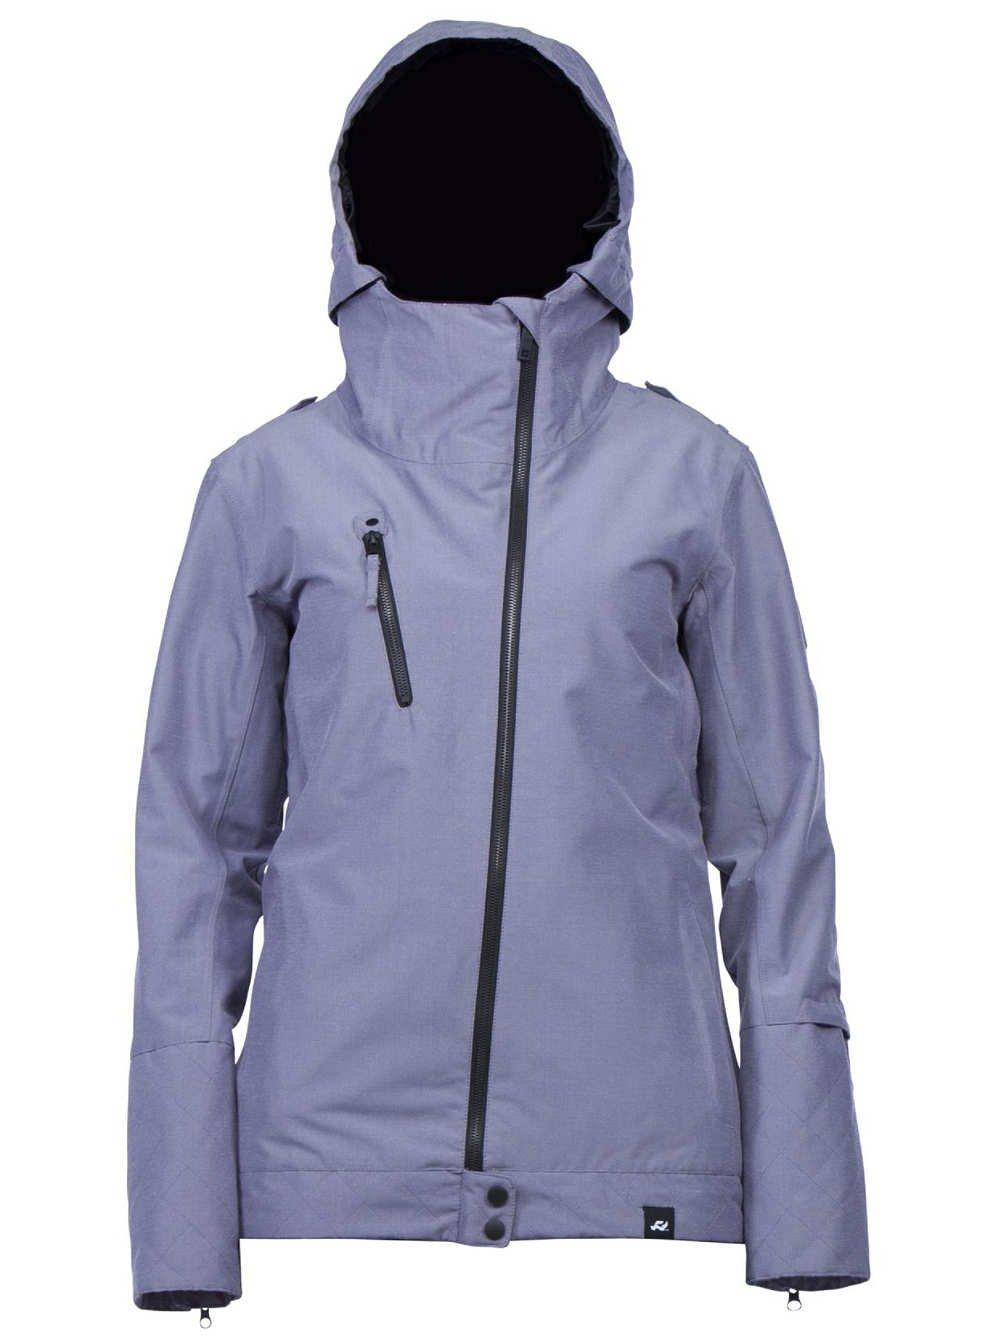 Damen Snowboard Jacke Ride Lenora Jacket